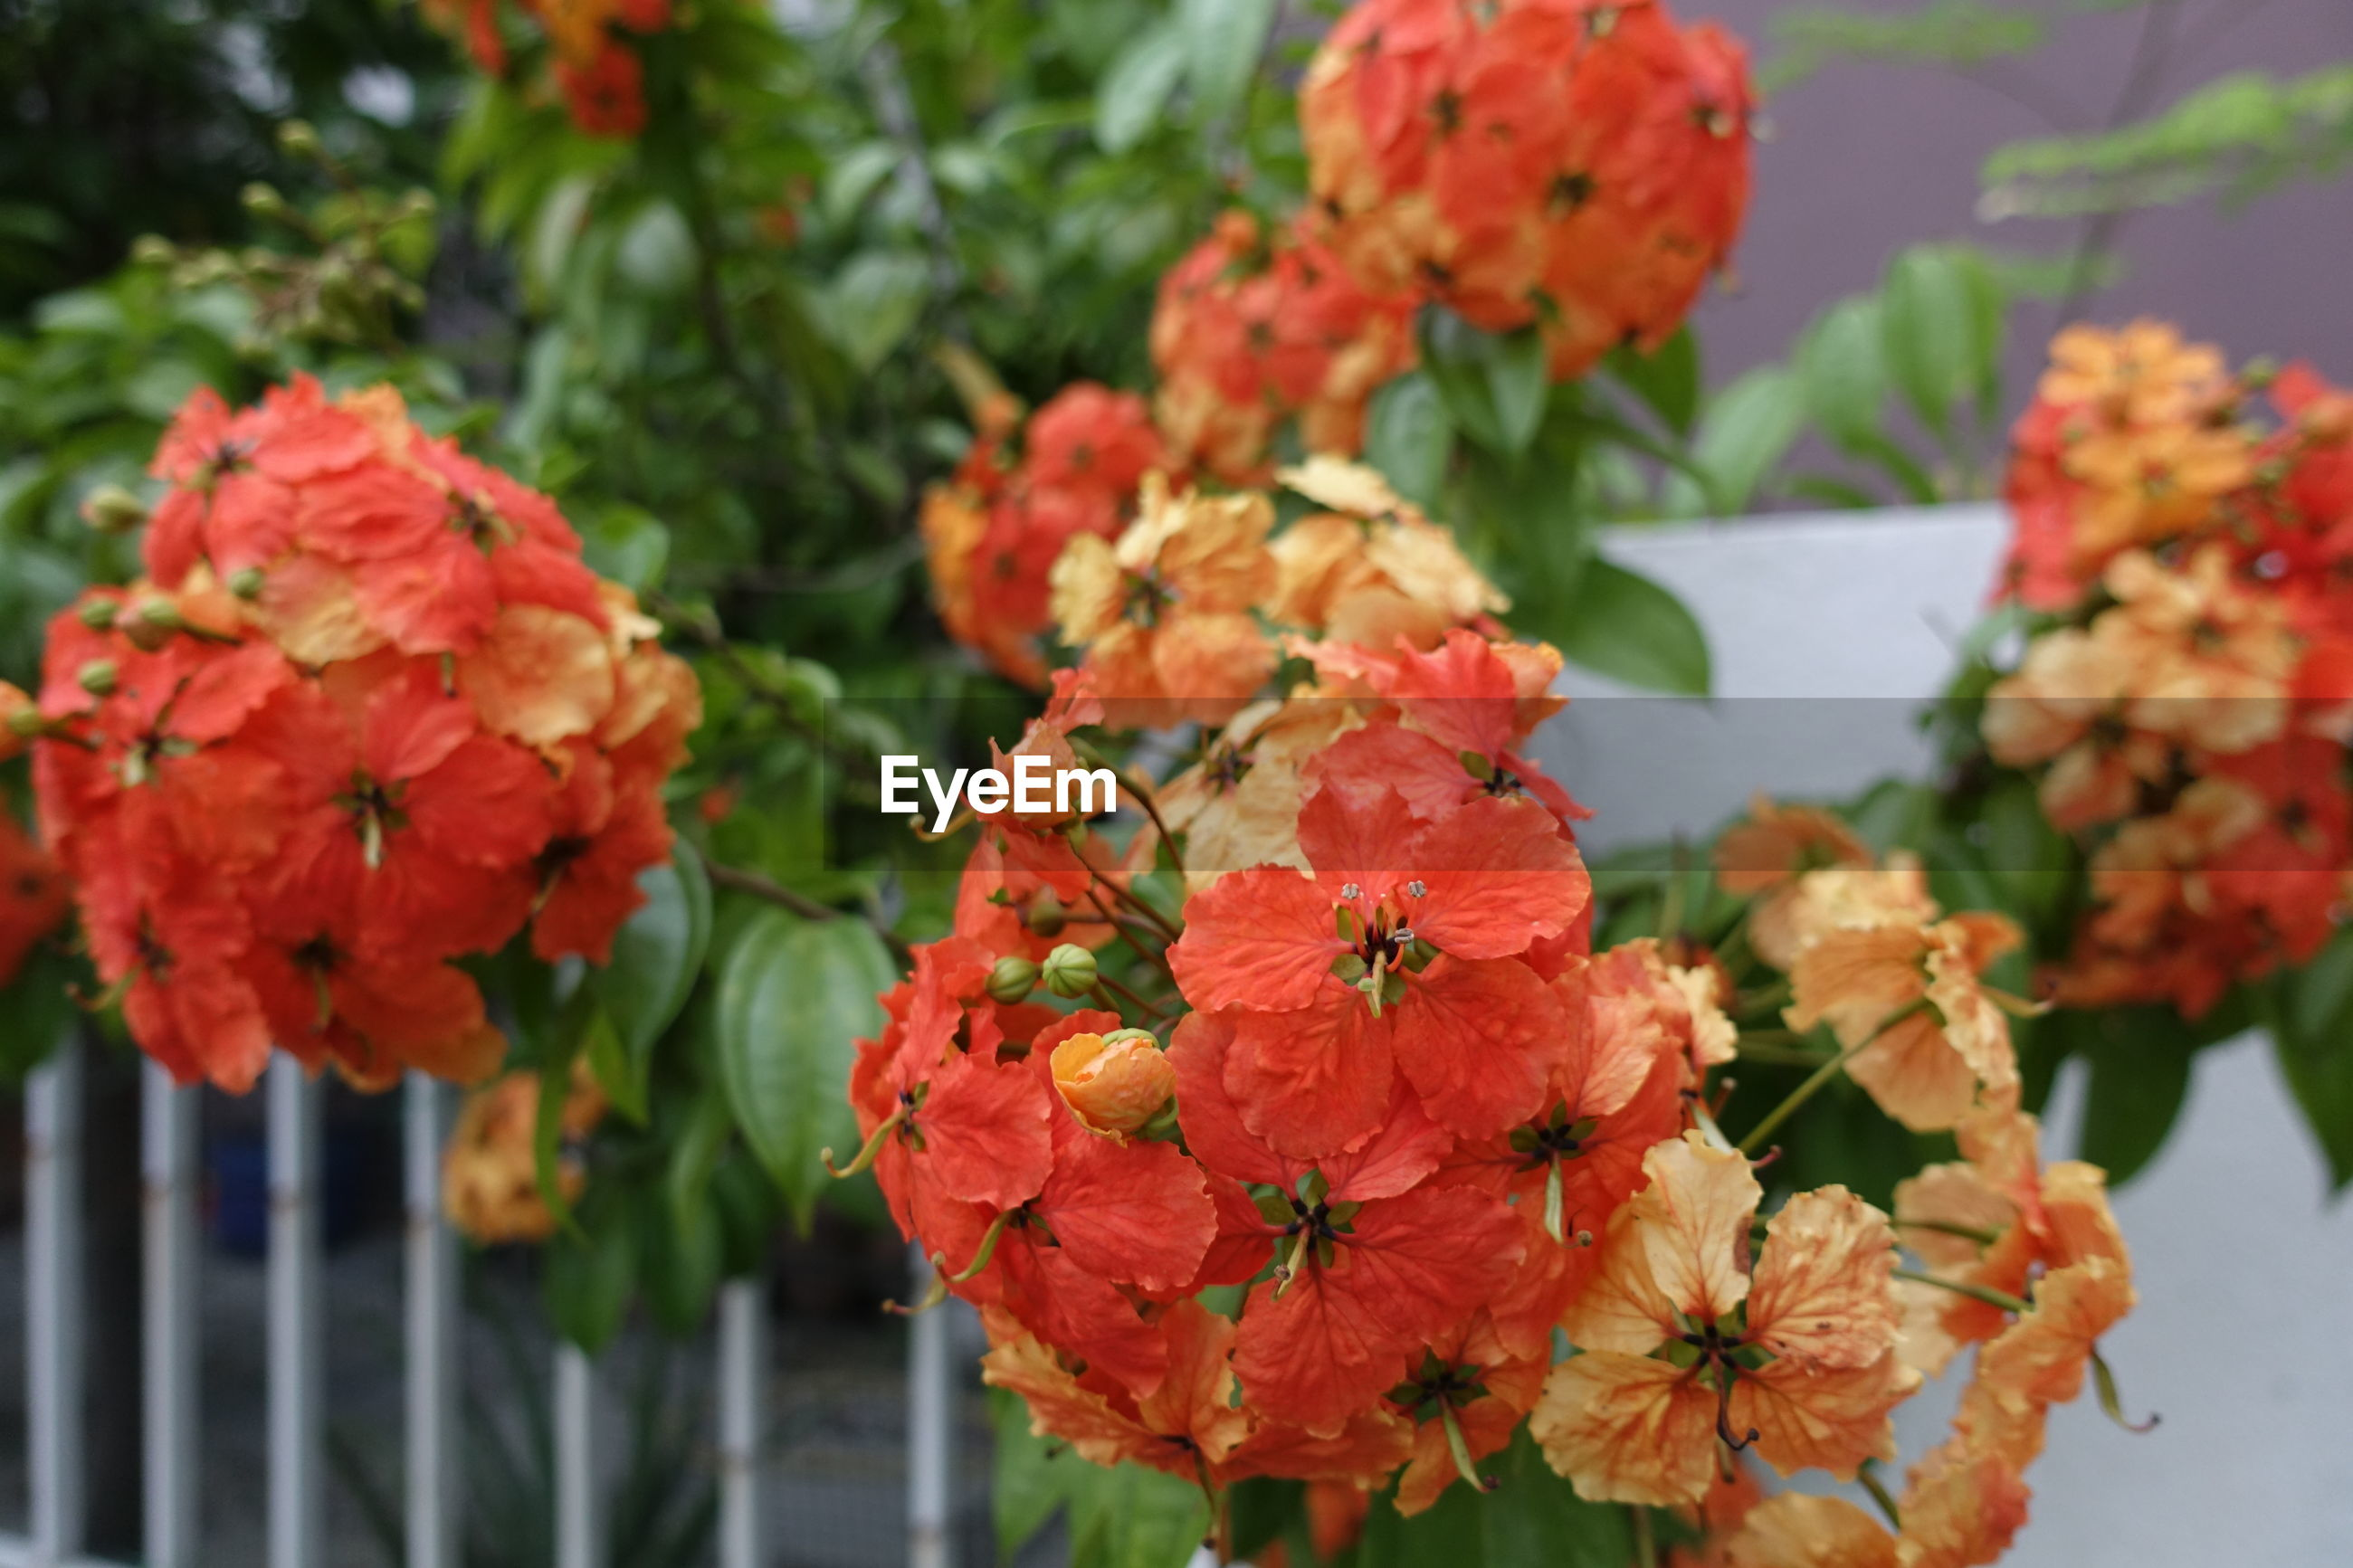 CLOSE-UP OF ORANGE FLOWERS BLOOMING